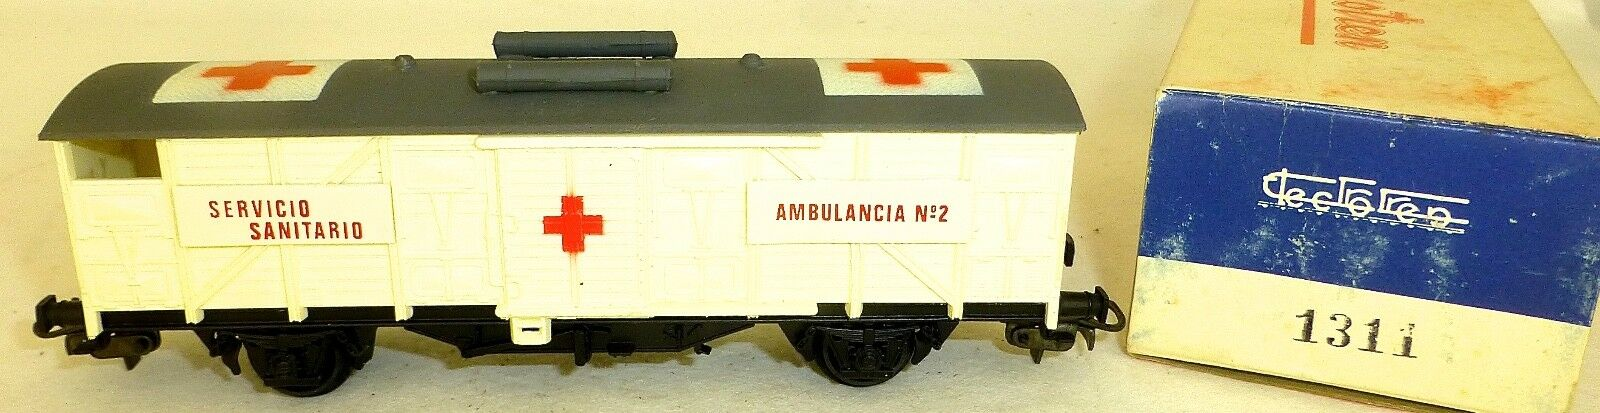 Servicio sanitario ambulancia no2 ELECTrossoREN 1311 h0 1 87 Å